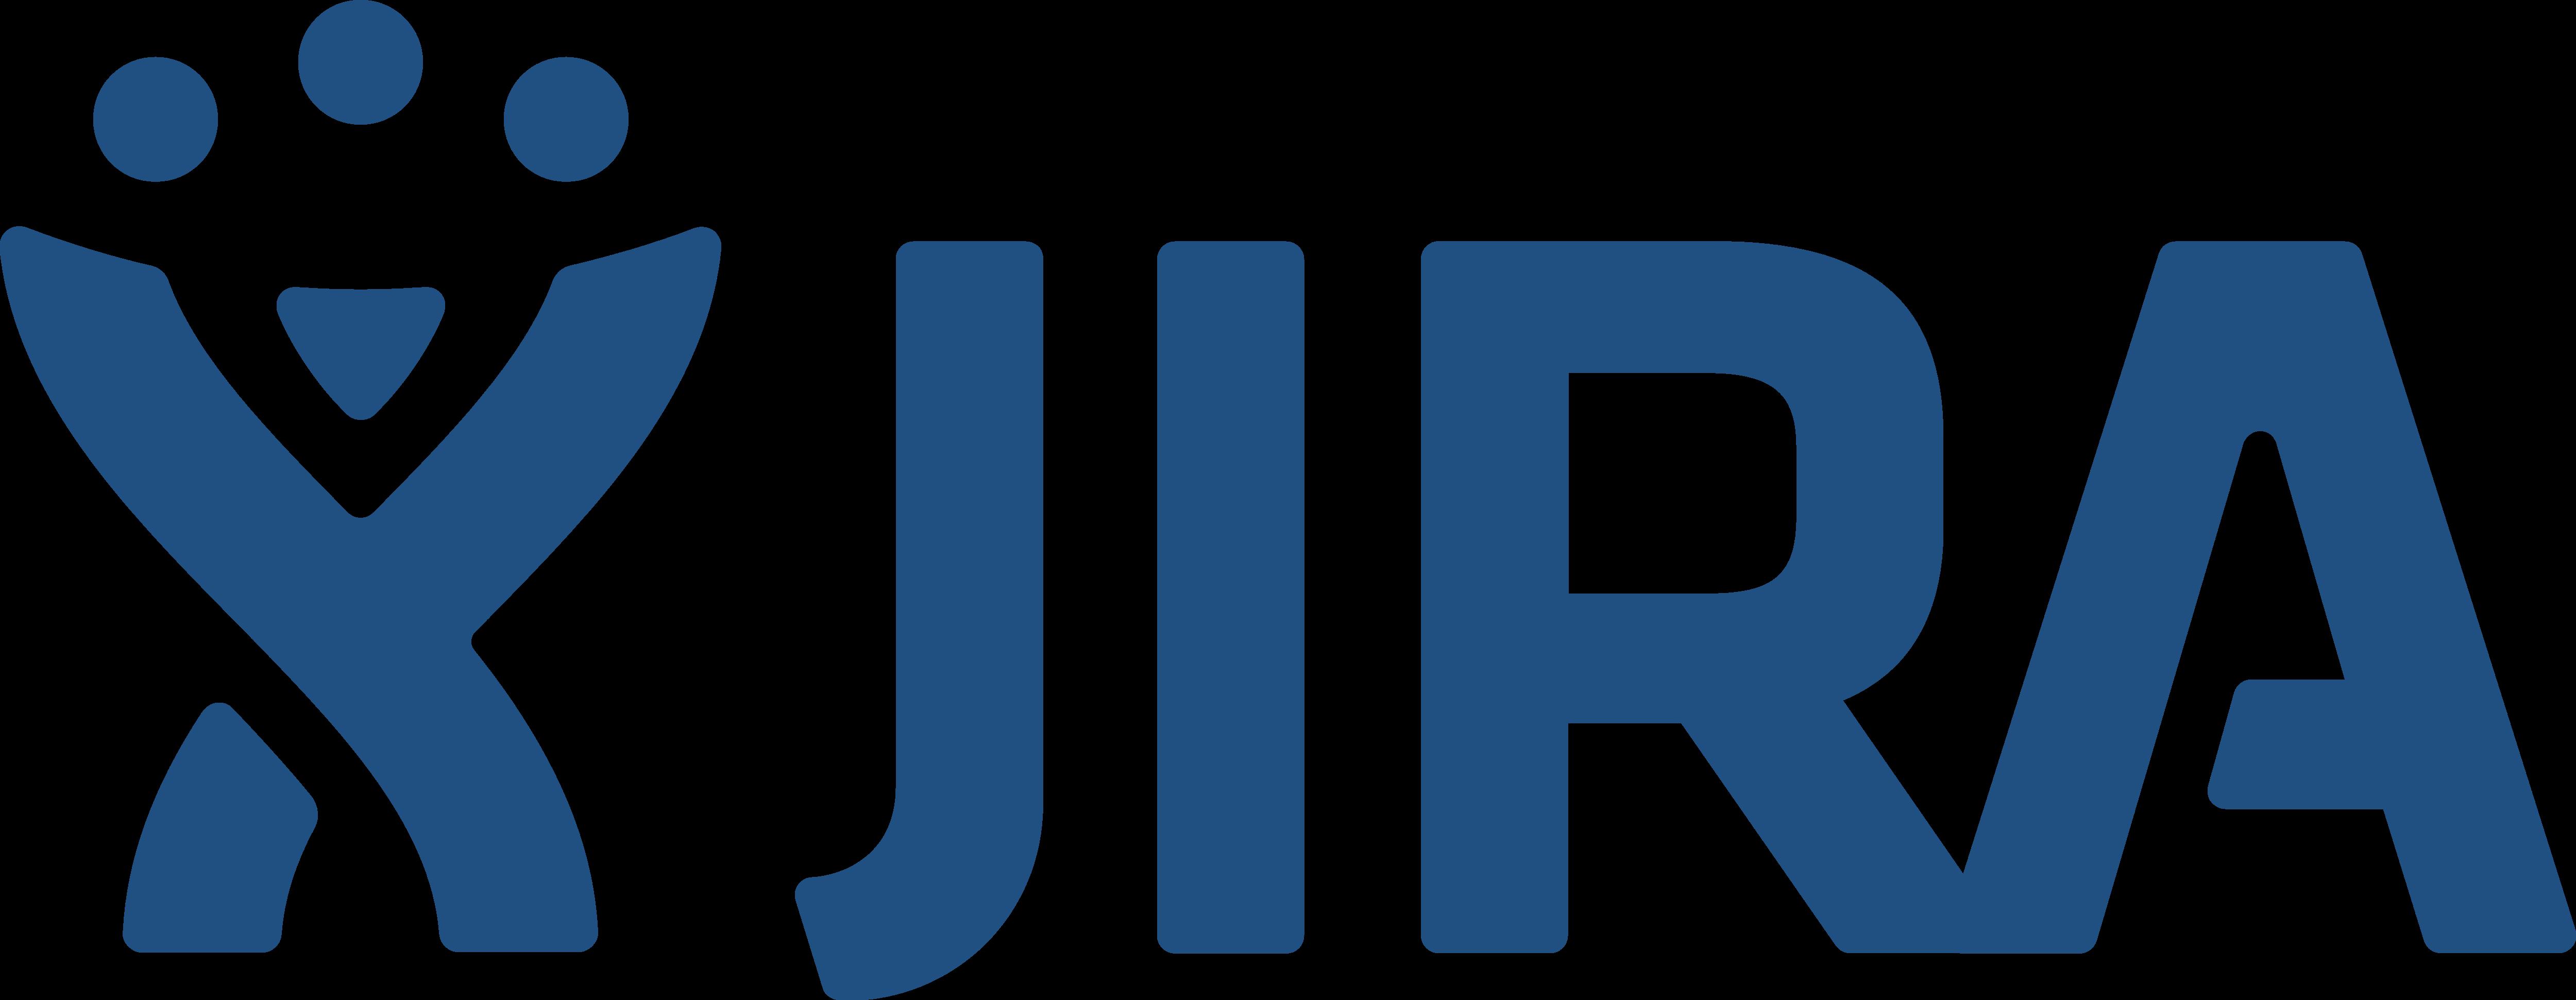 Jira Software Logos Download